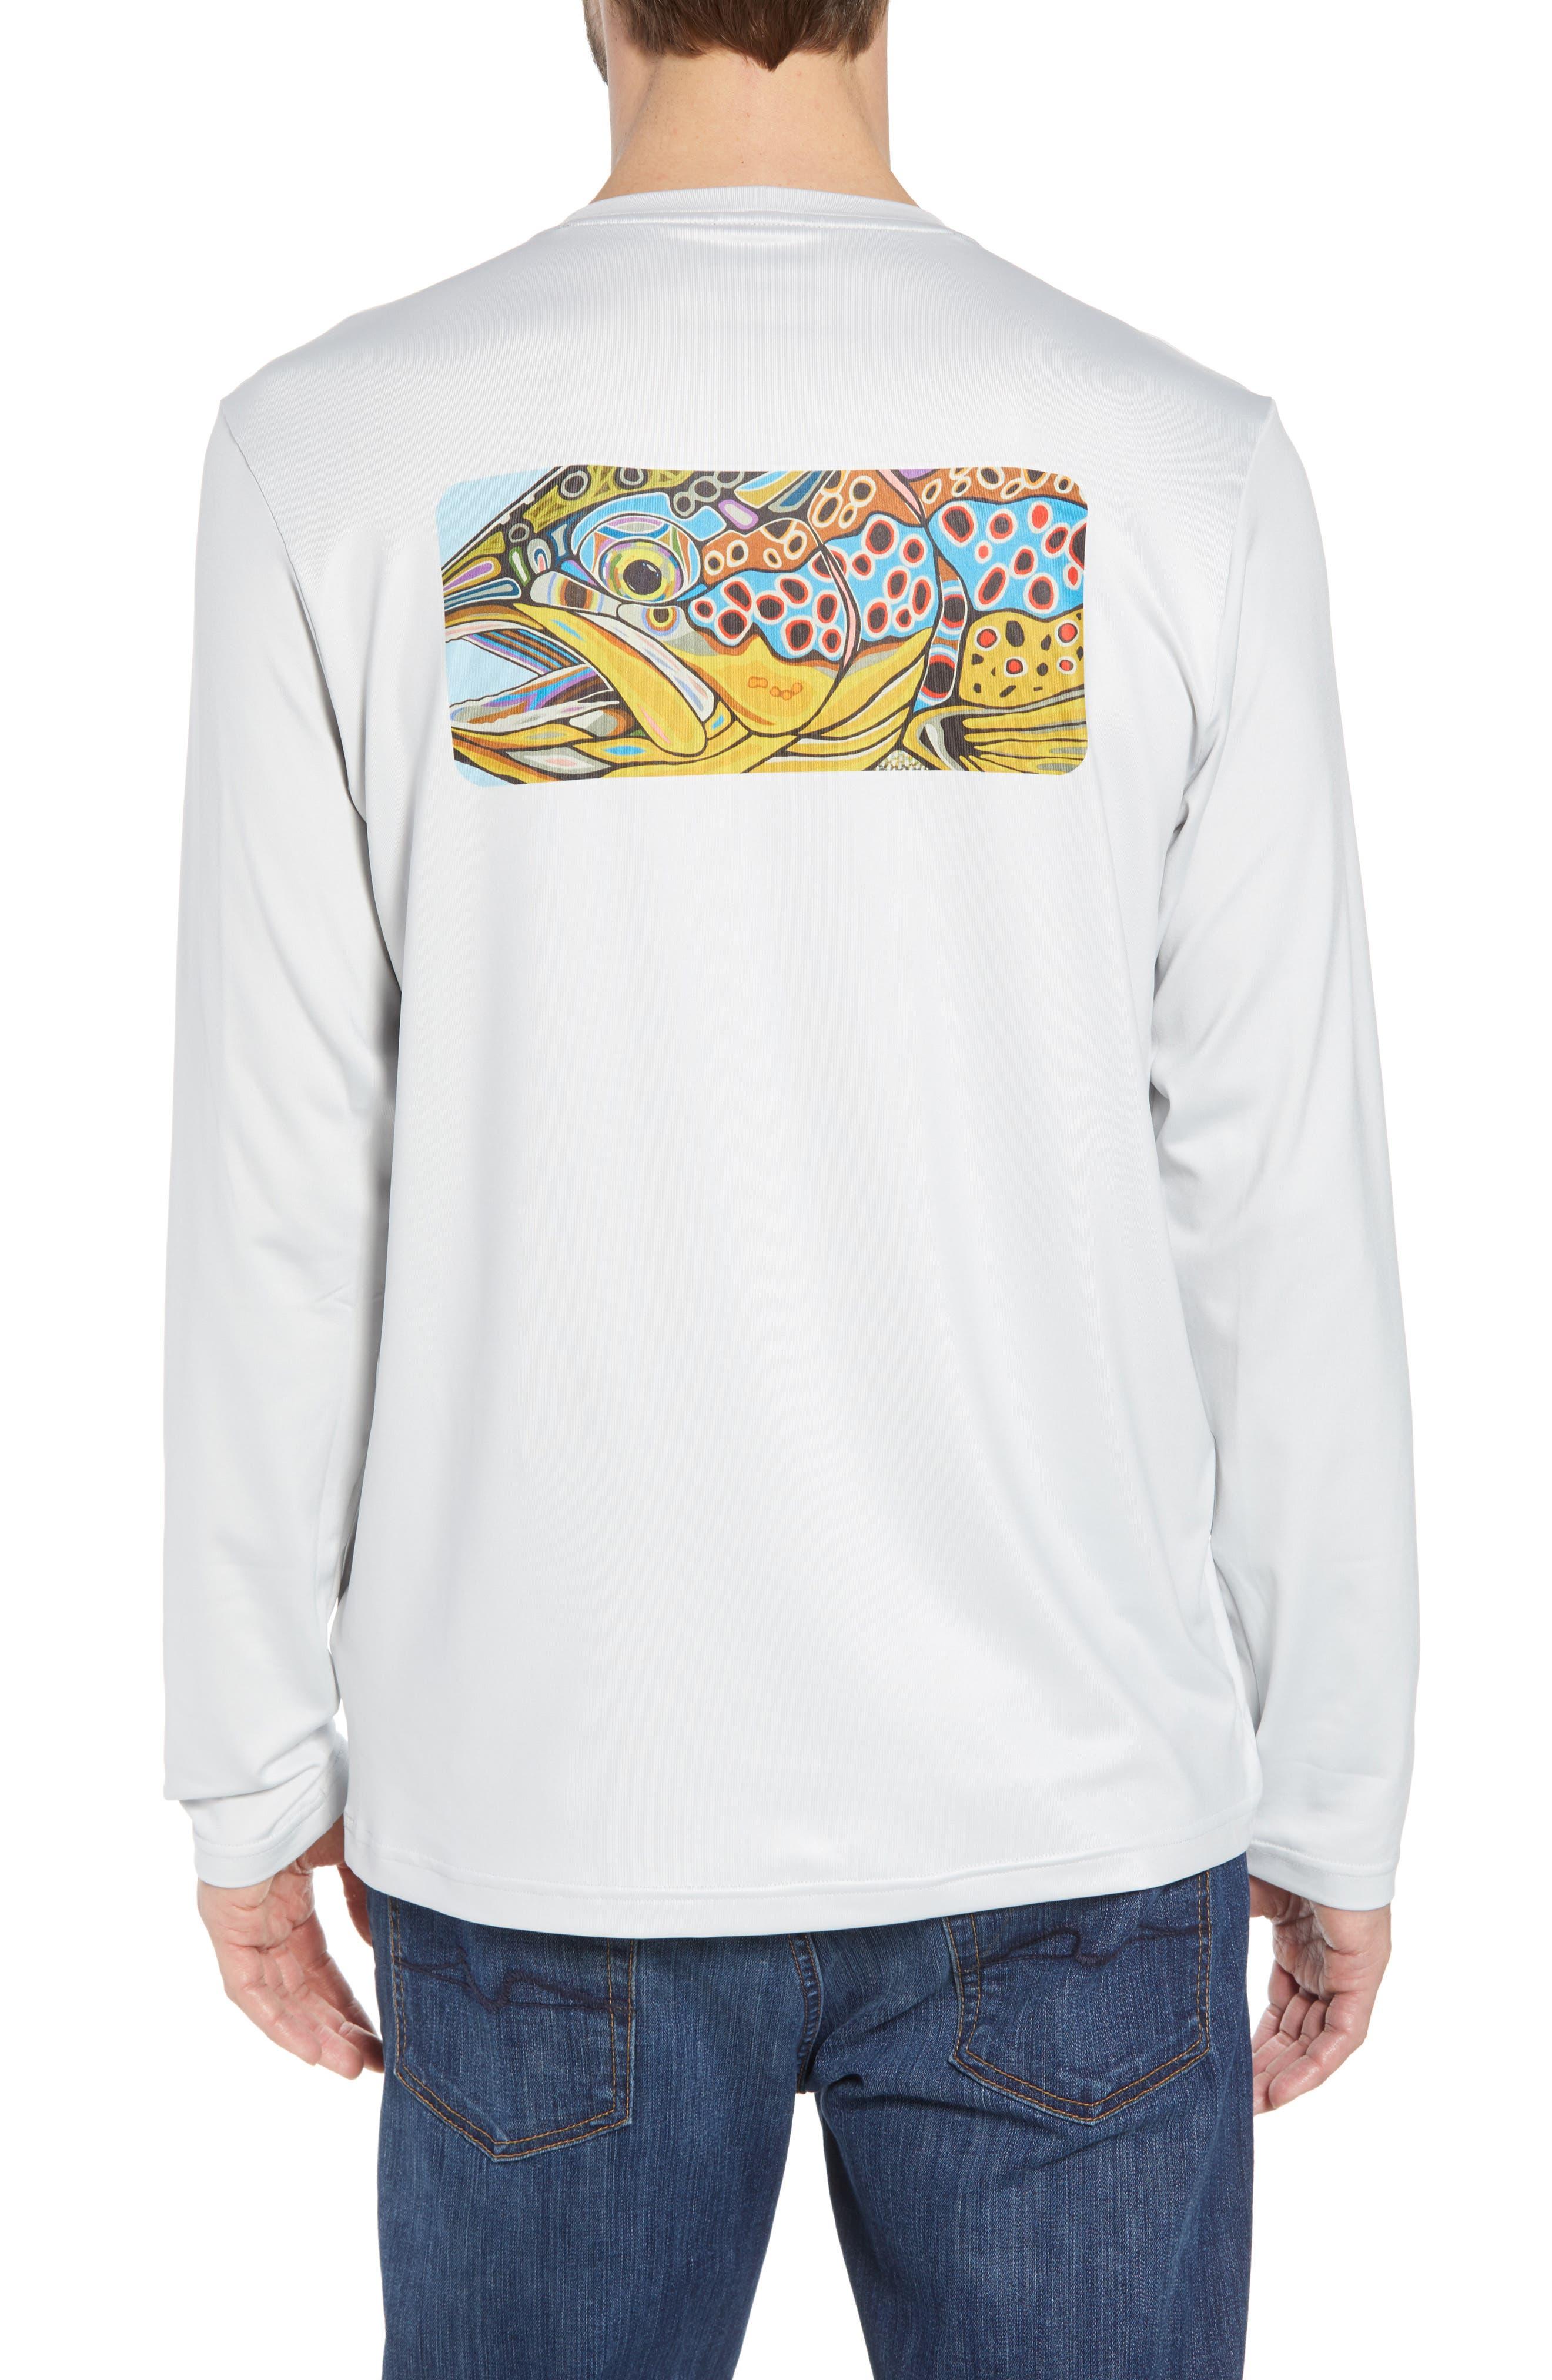 Tech Fish Graphic Long Sleeve T-Shirt,                             Alternate thumbnail 5, color,